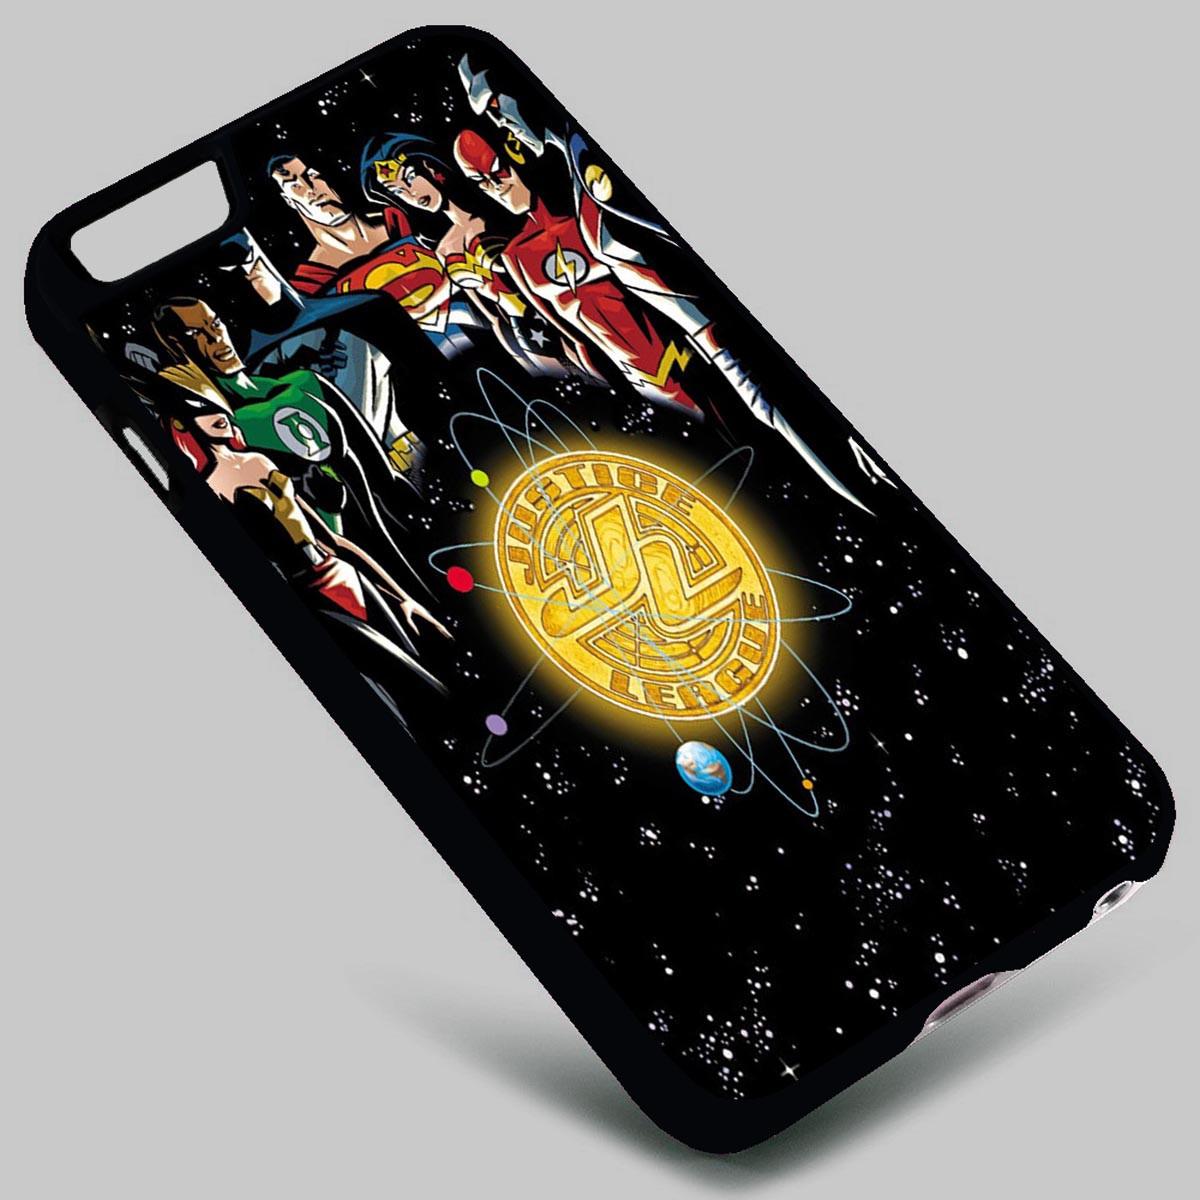 Justice League Batman Wonder Woman Superman The Flash Green Lantern on your case iphone 4 4s 5 5s 5c 6 6plus 7 Samsung Galaxy s3 s4 s5 s6 s7 HTC Case